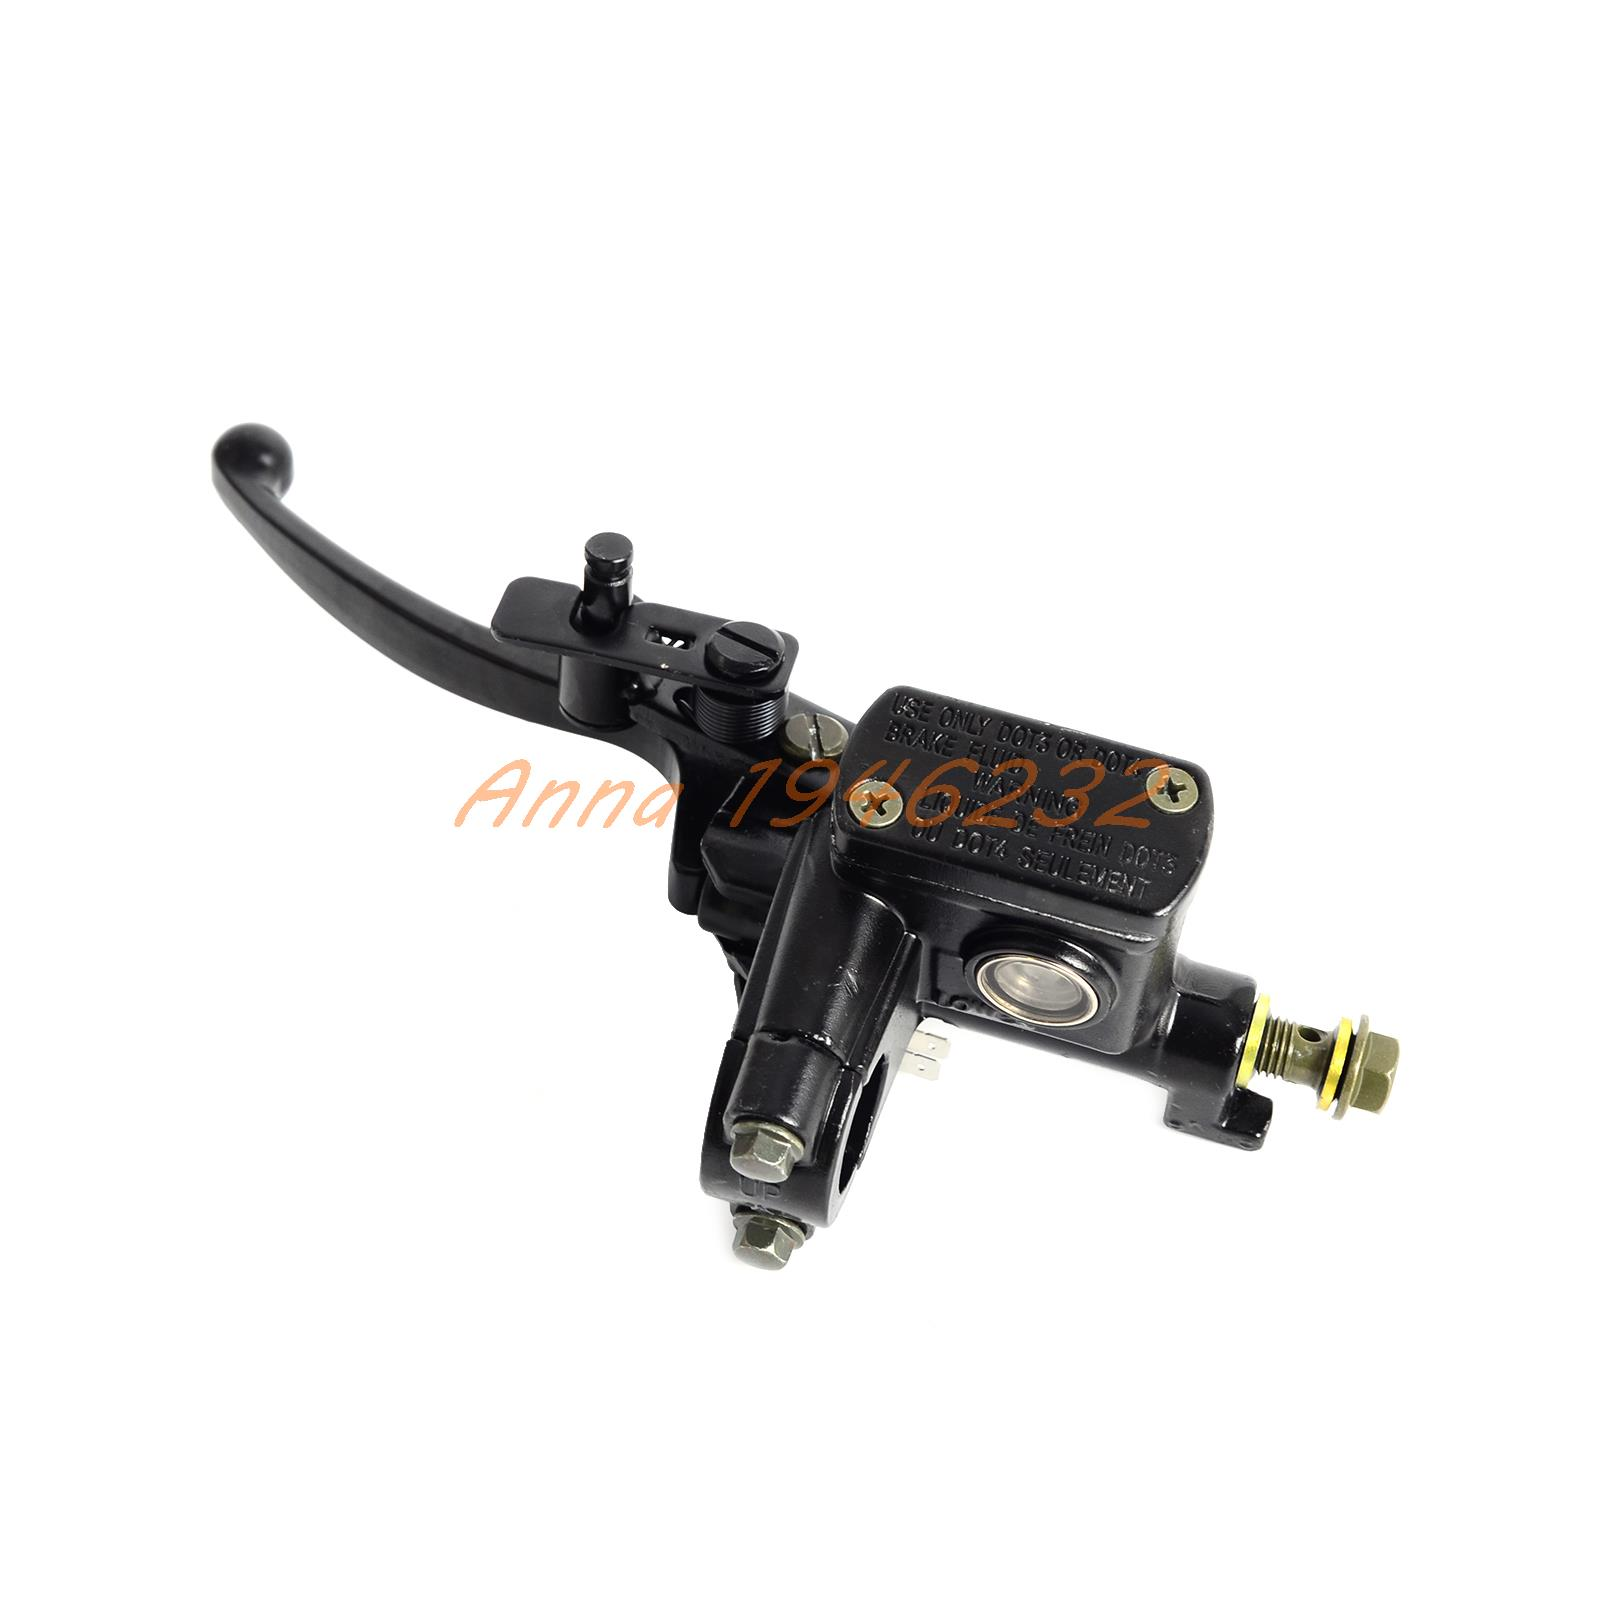 Brake Master Cylinder Left Hand Lever for 50 70 90 110 125 150 cc ATV uad Tao Tao Kazuma Lifan Buyang датчик lifan auto lifan 2